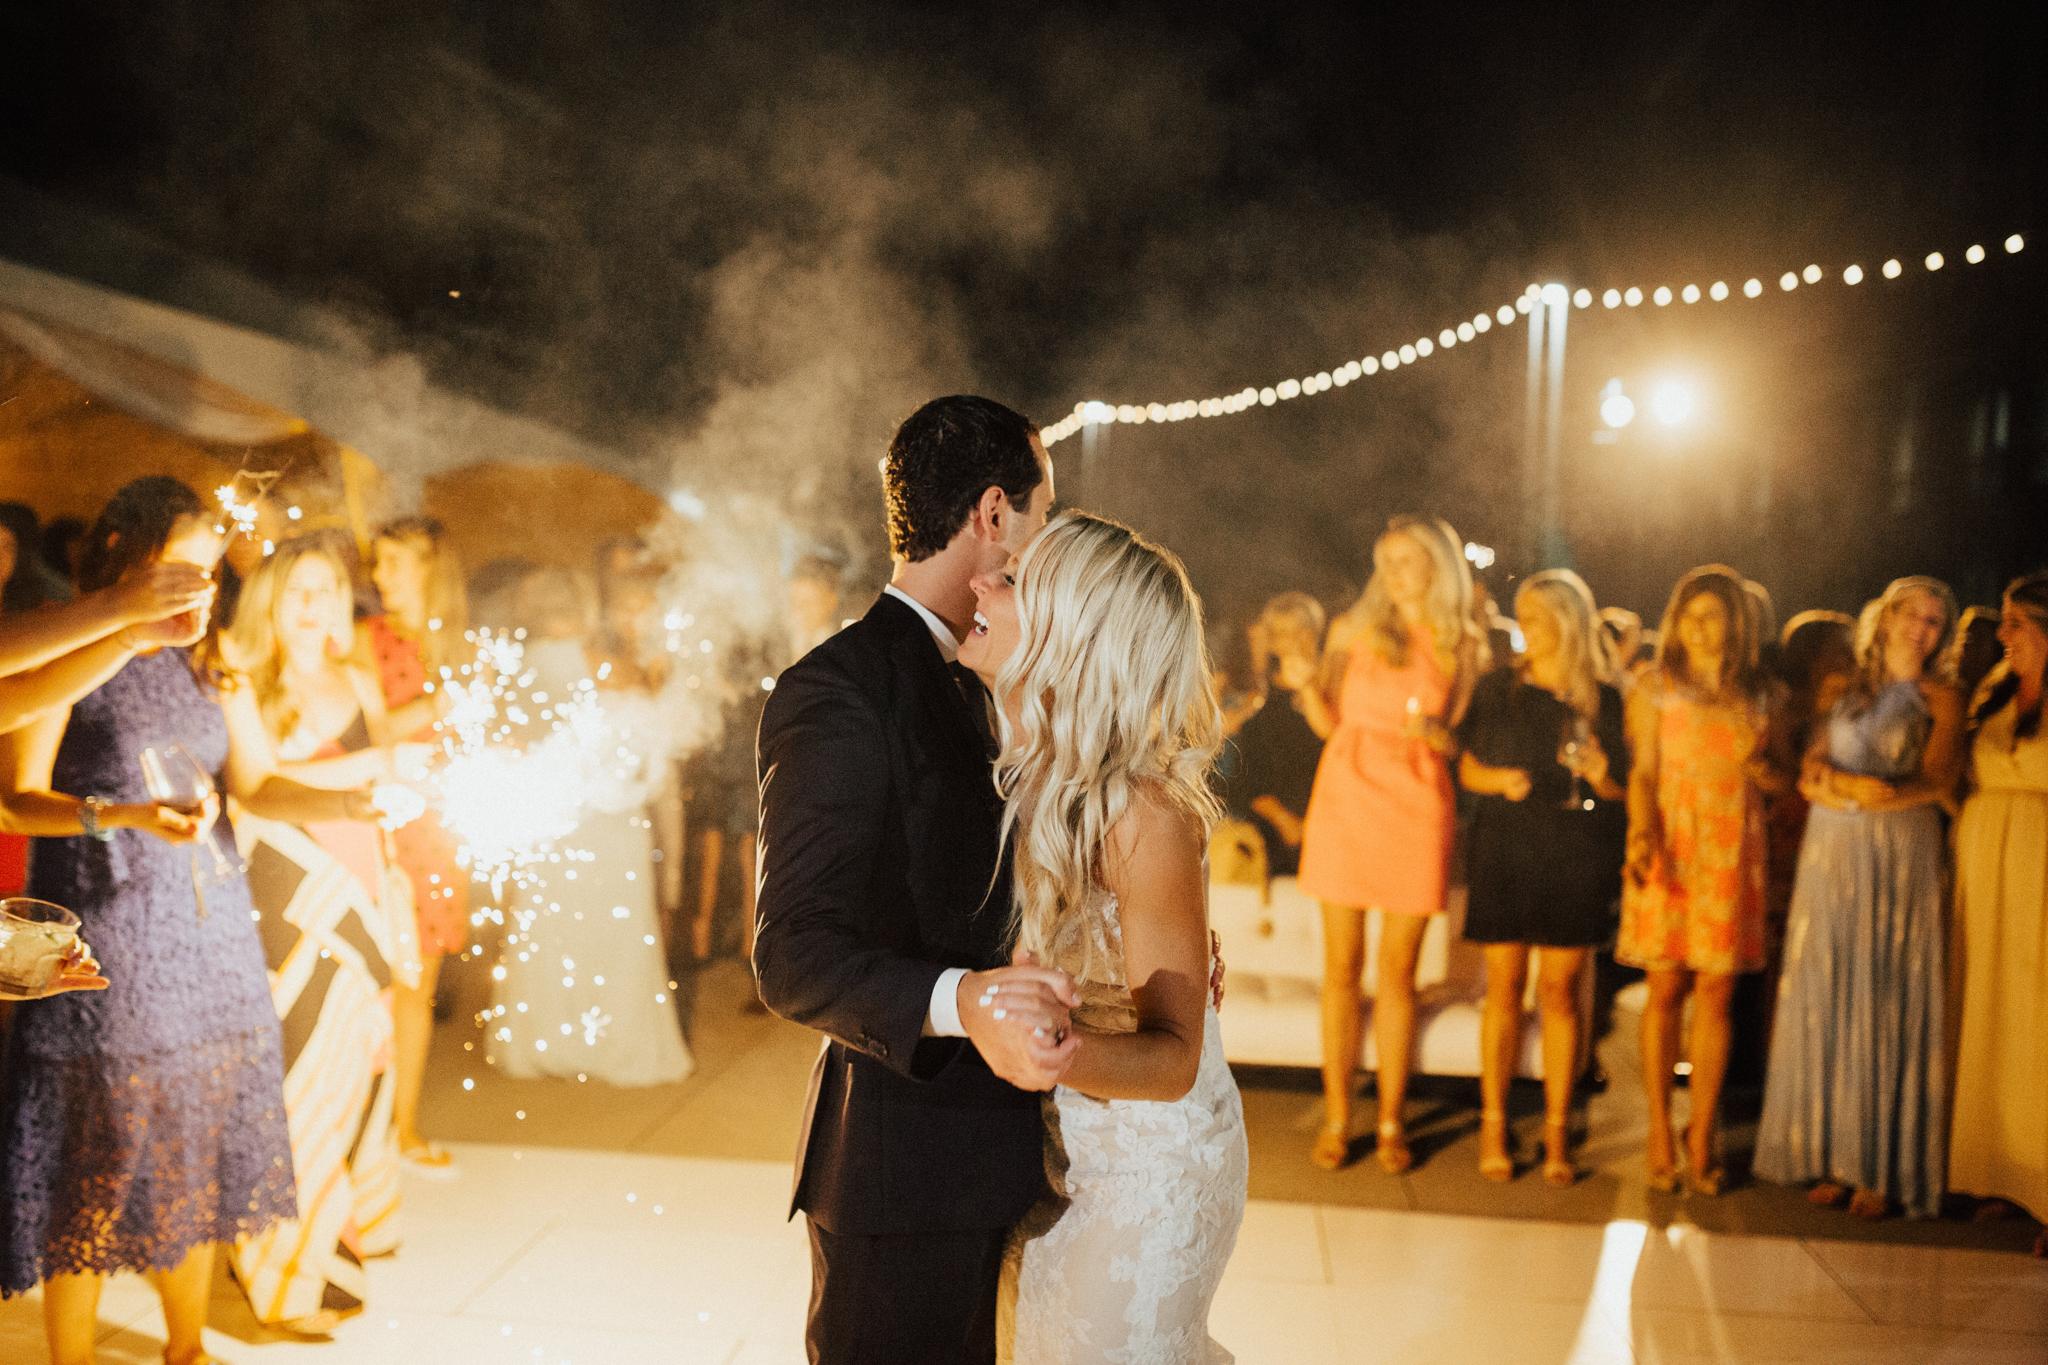 Arizona-Adventure-Elopement-Wedding-Photographer-12.jpg